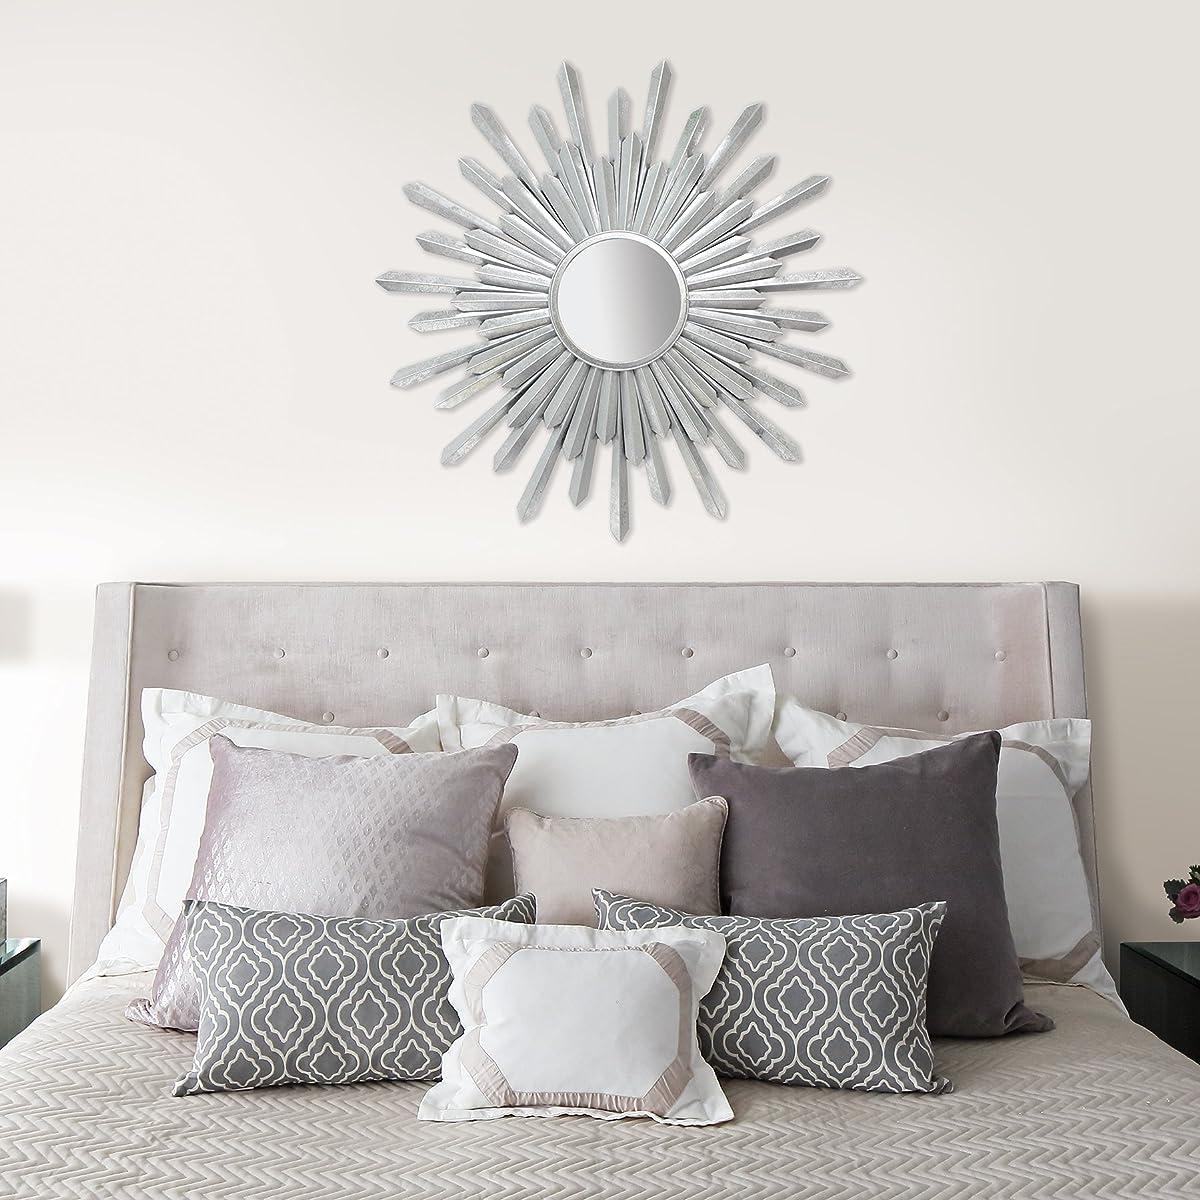 Fetco Bembury Sunburst Mirror, Silver